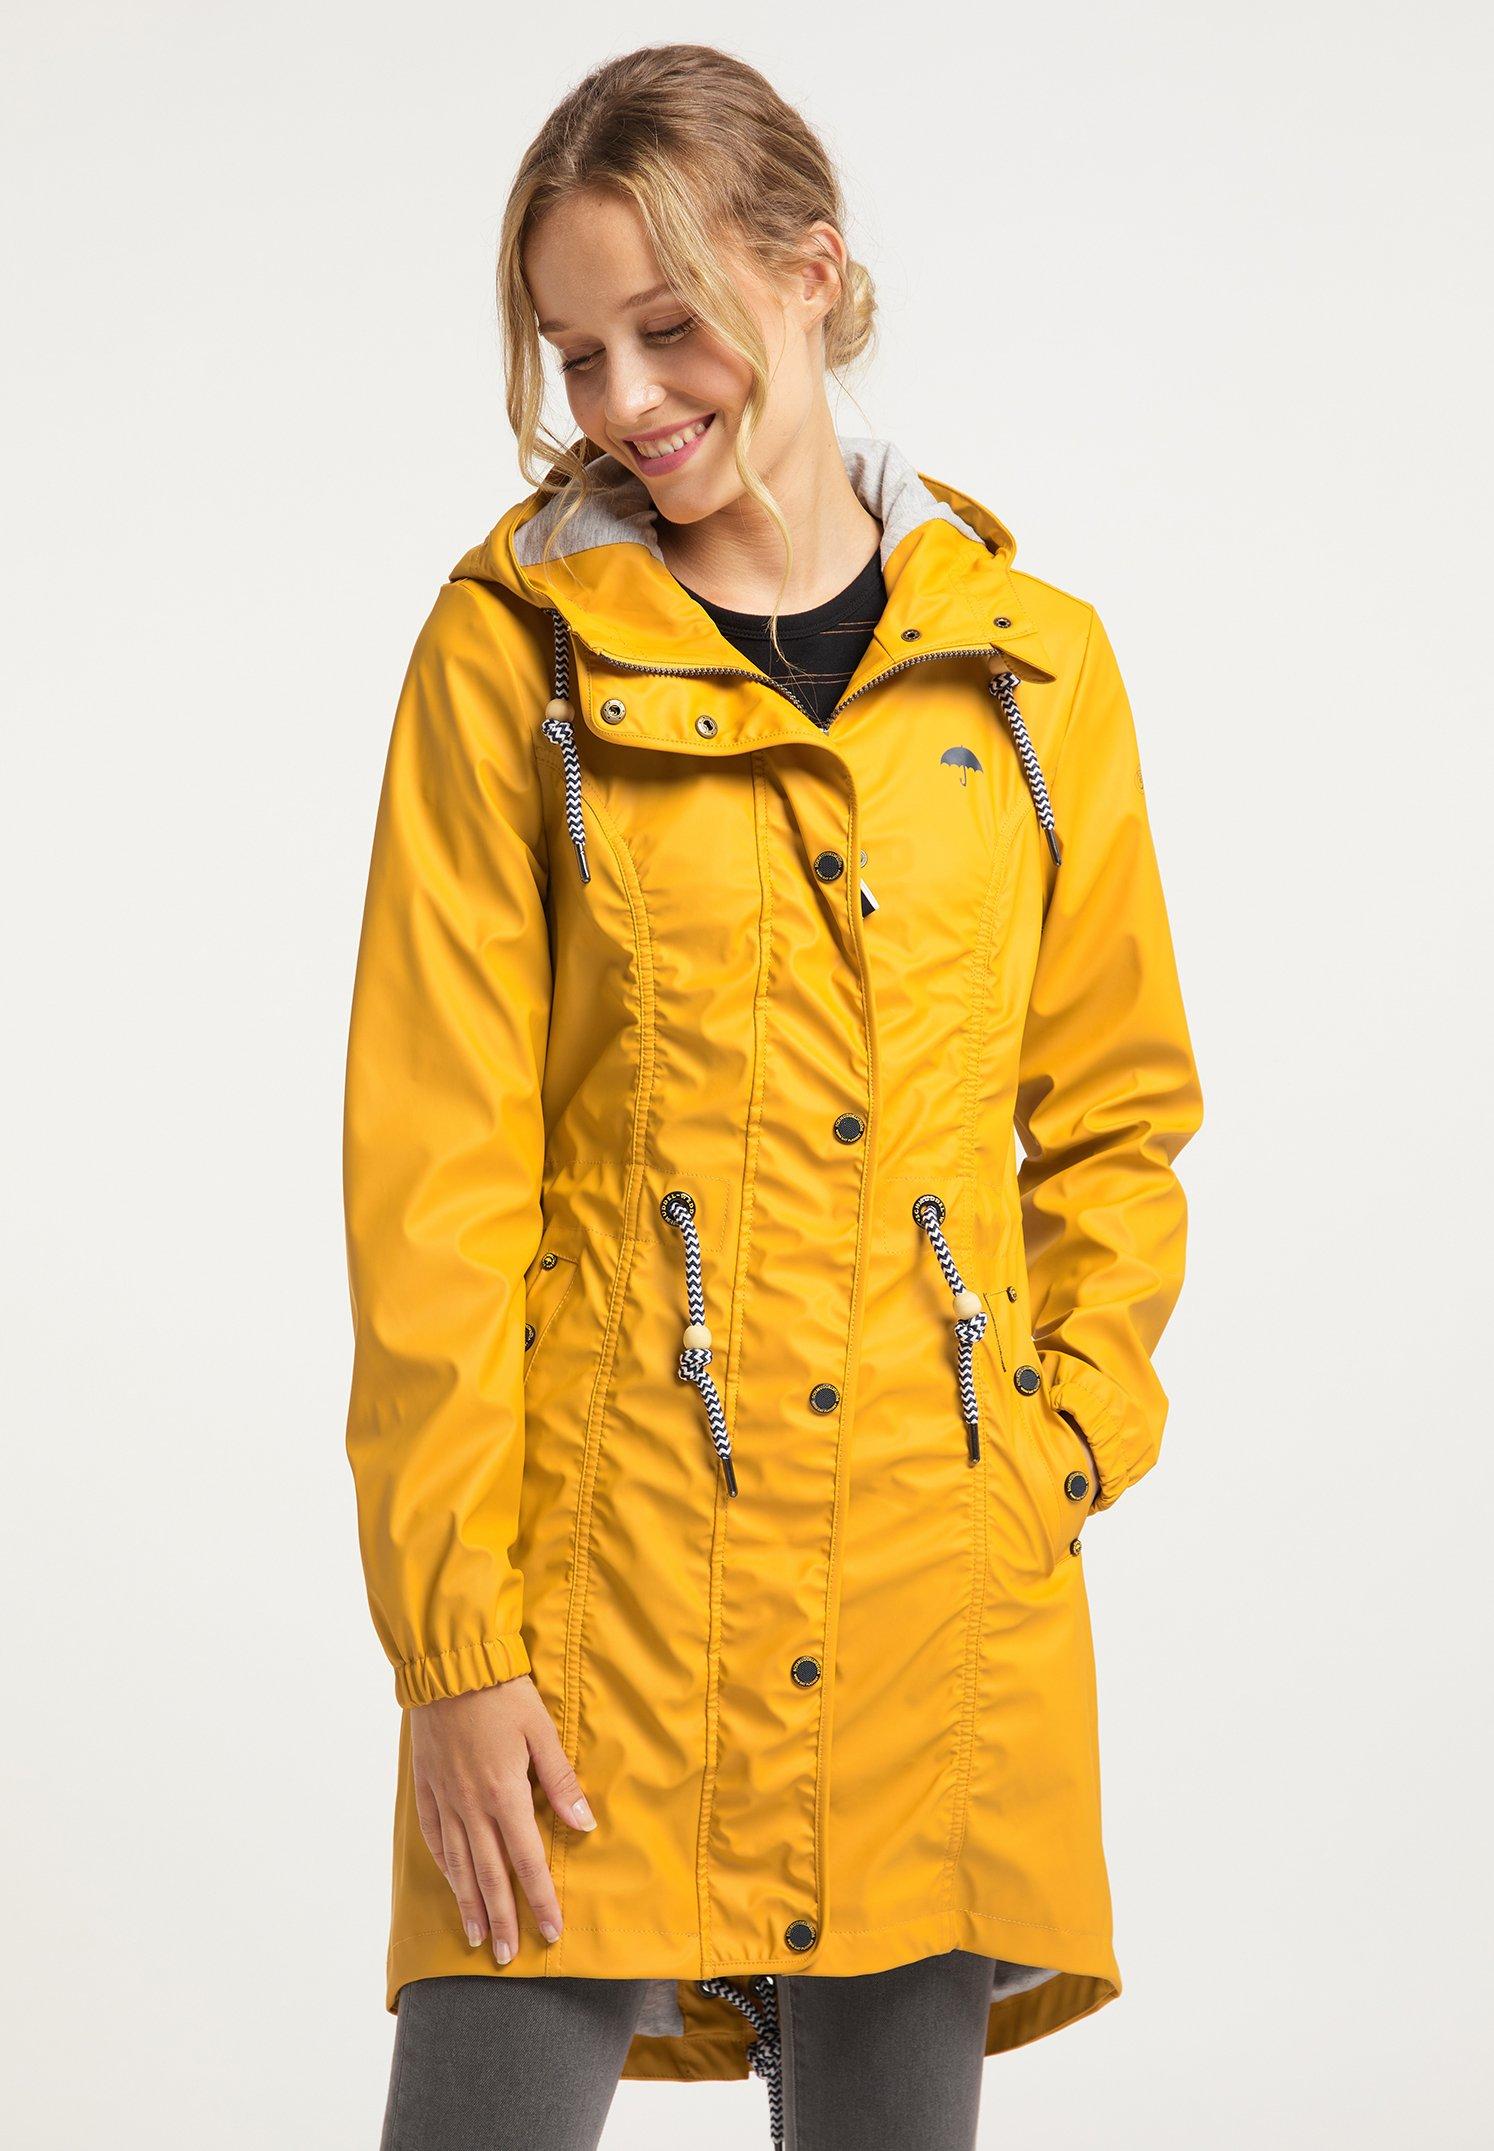 Schmuddelwedda Damen Jacke gelb pink weiß |